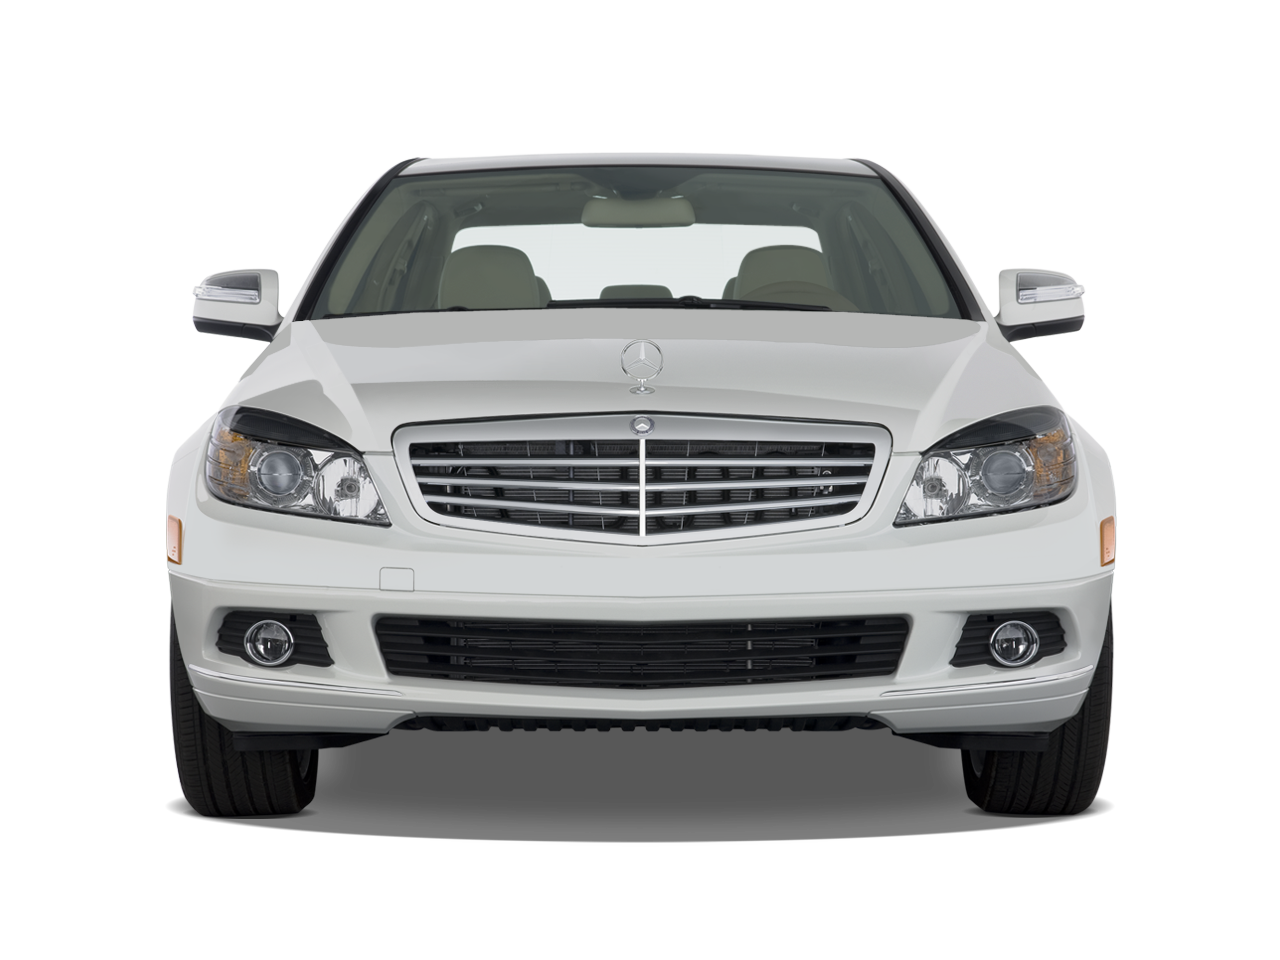 2009 Mercedes Benz C300 - Mercedes Benz Luxury Sedan ...